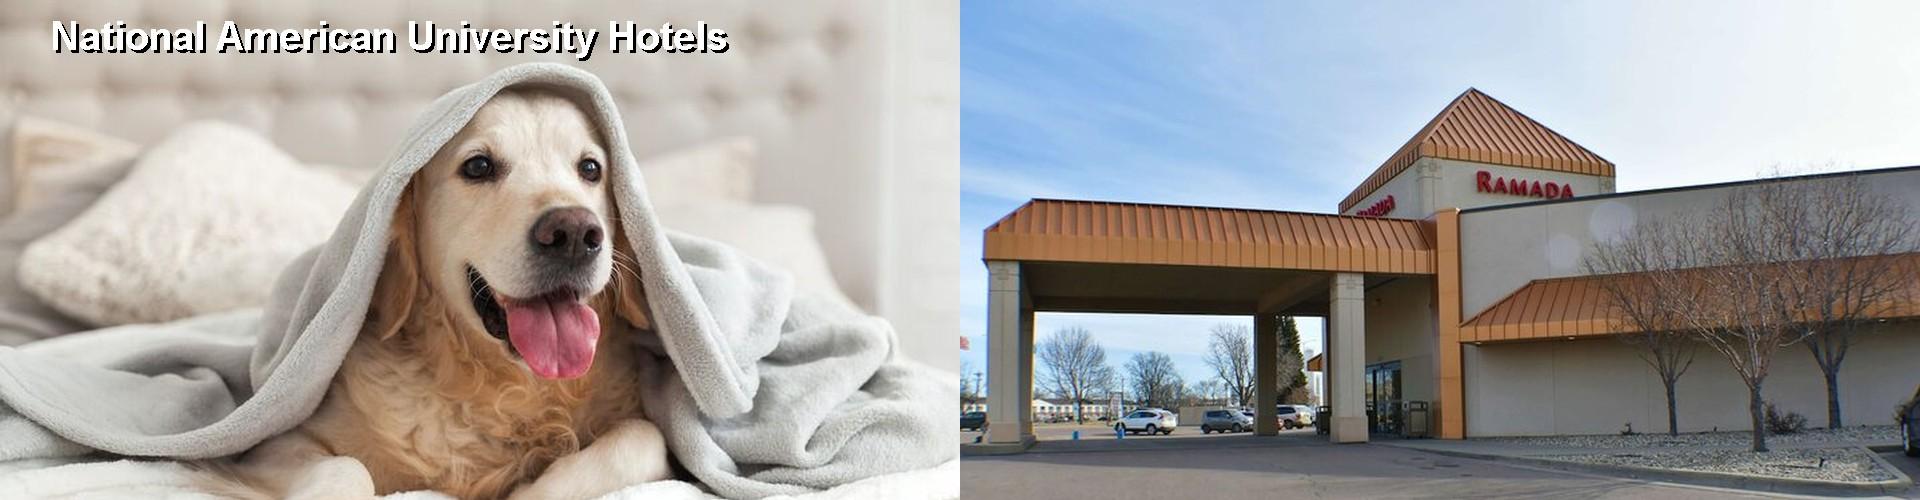 5 Best Hotels Near National American University